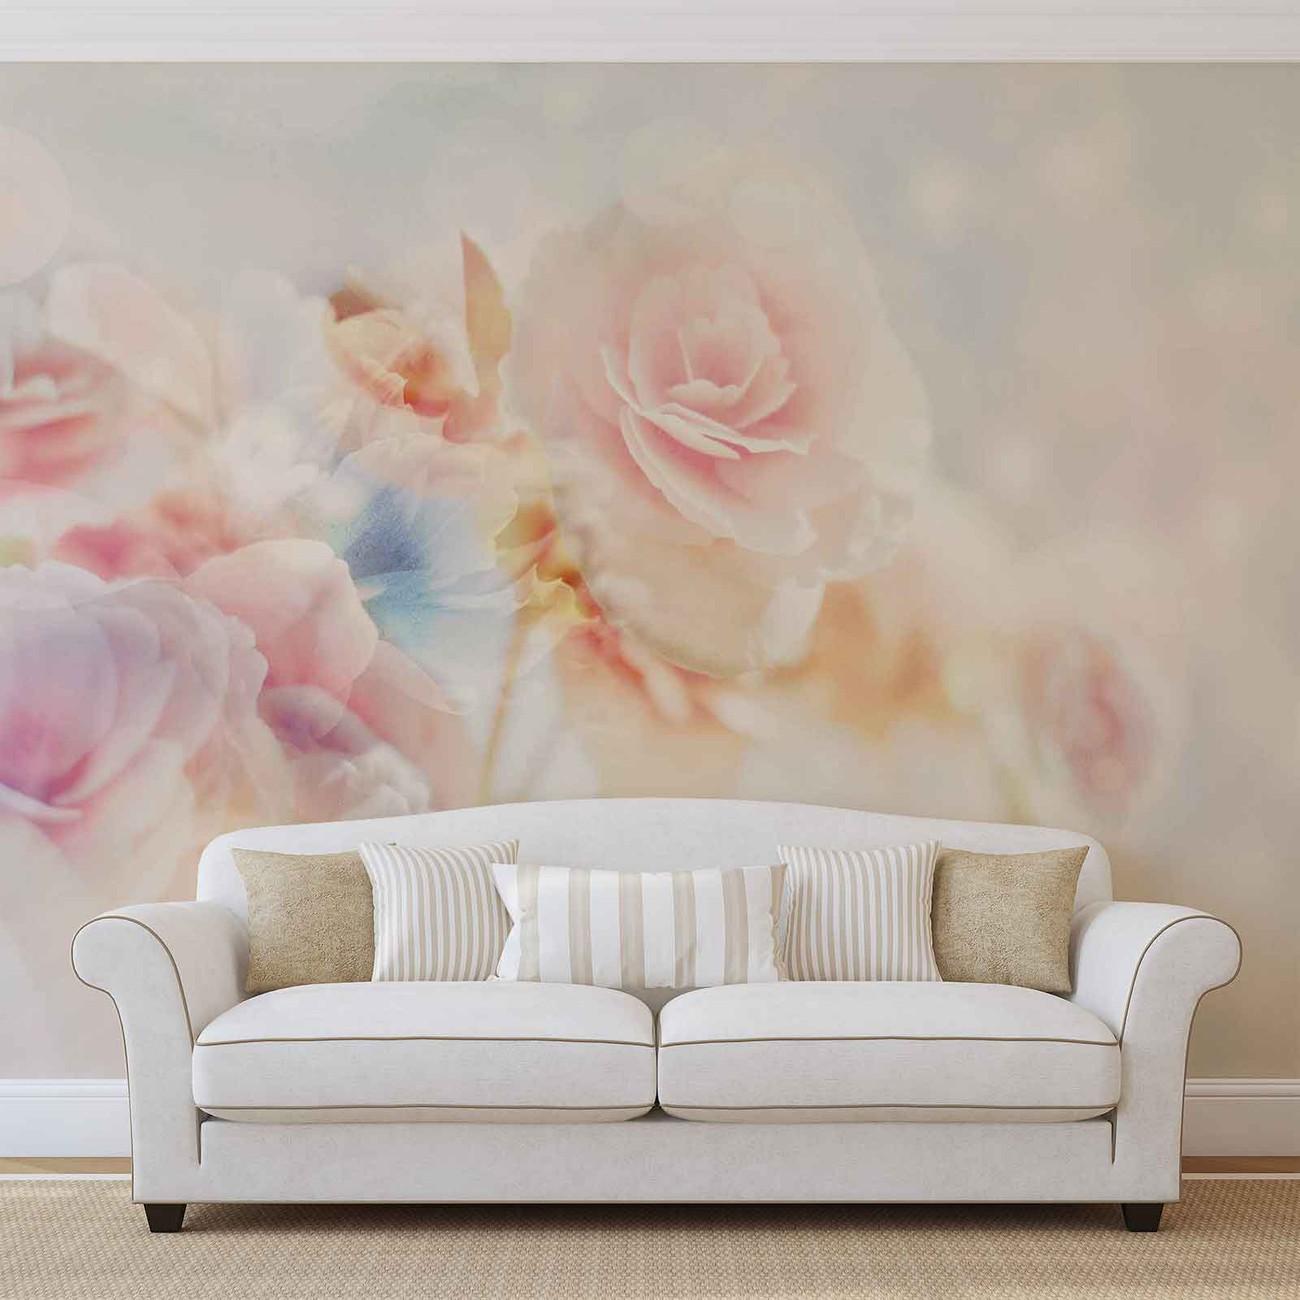 Kwiaty pastelowe kolory fototapeta tapeta kup na for Carta da parati fiori grandi